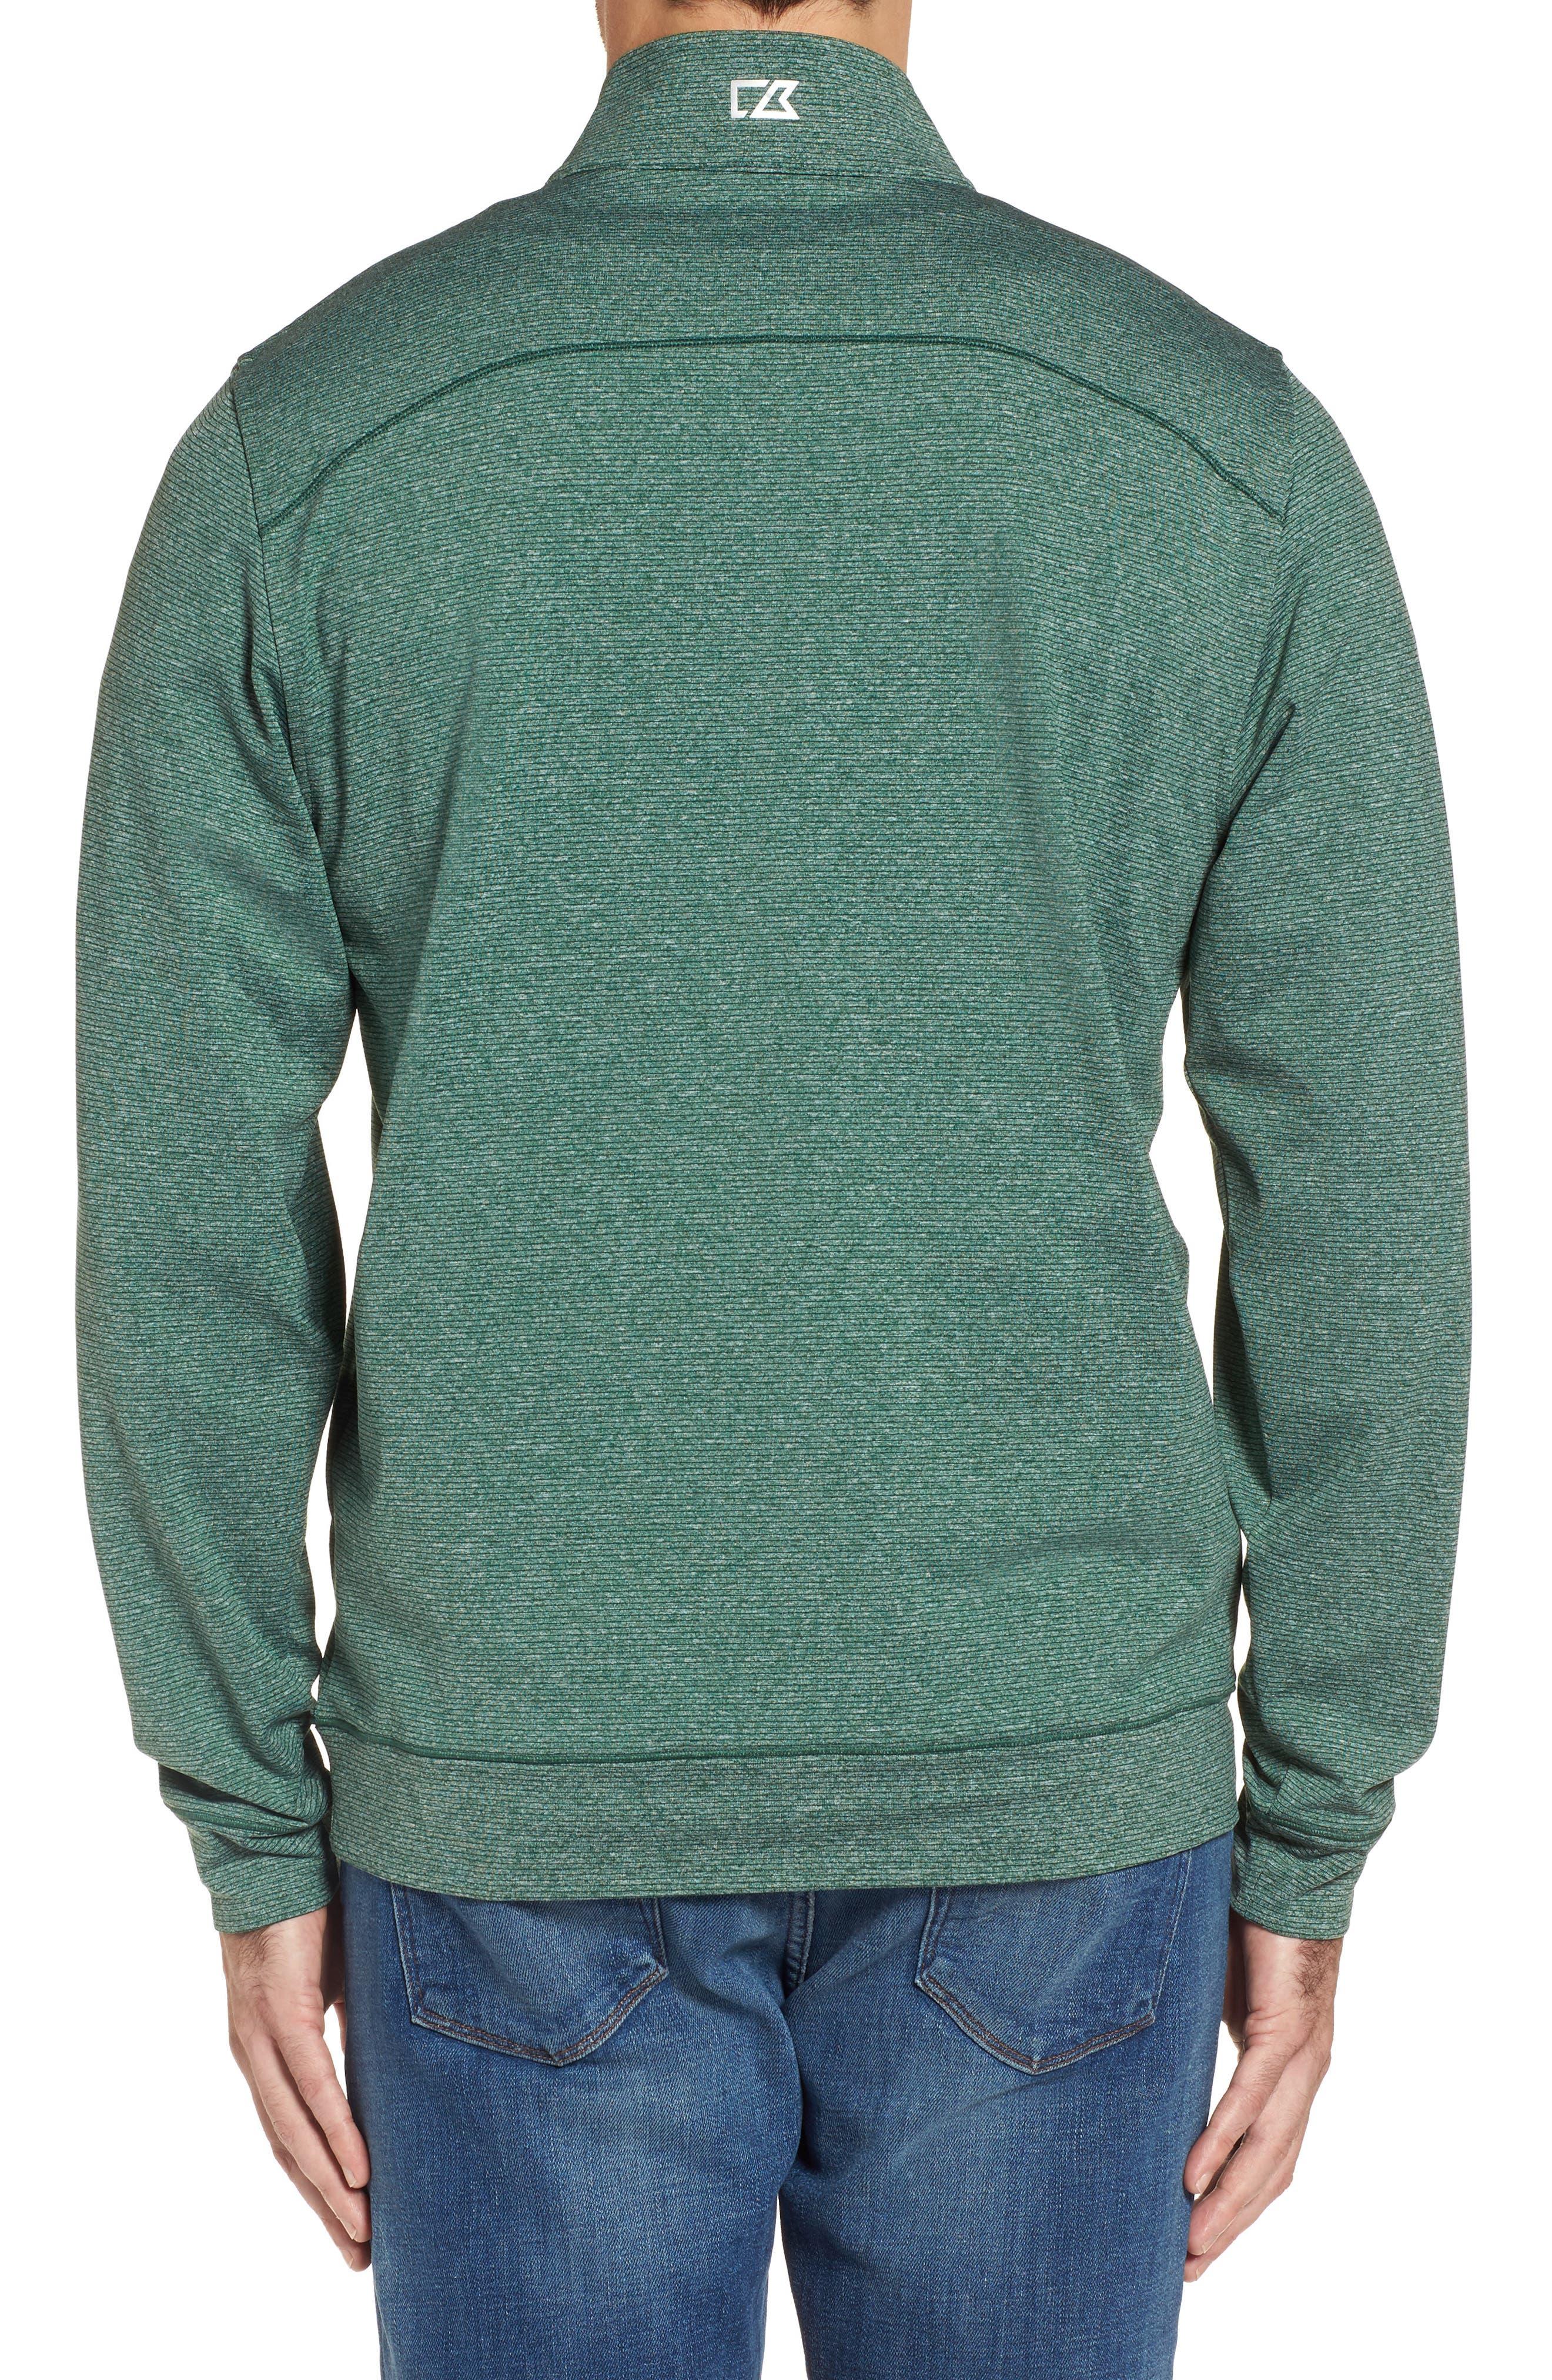 Shoreline - New York Jets Half Zip Pullover,                             Alternate thumbnail 2, color,                             308